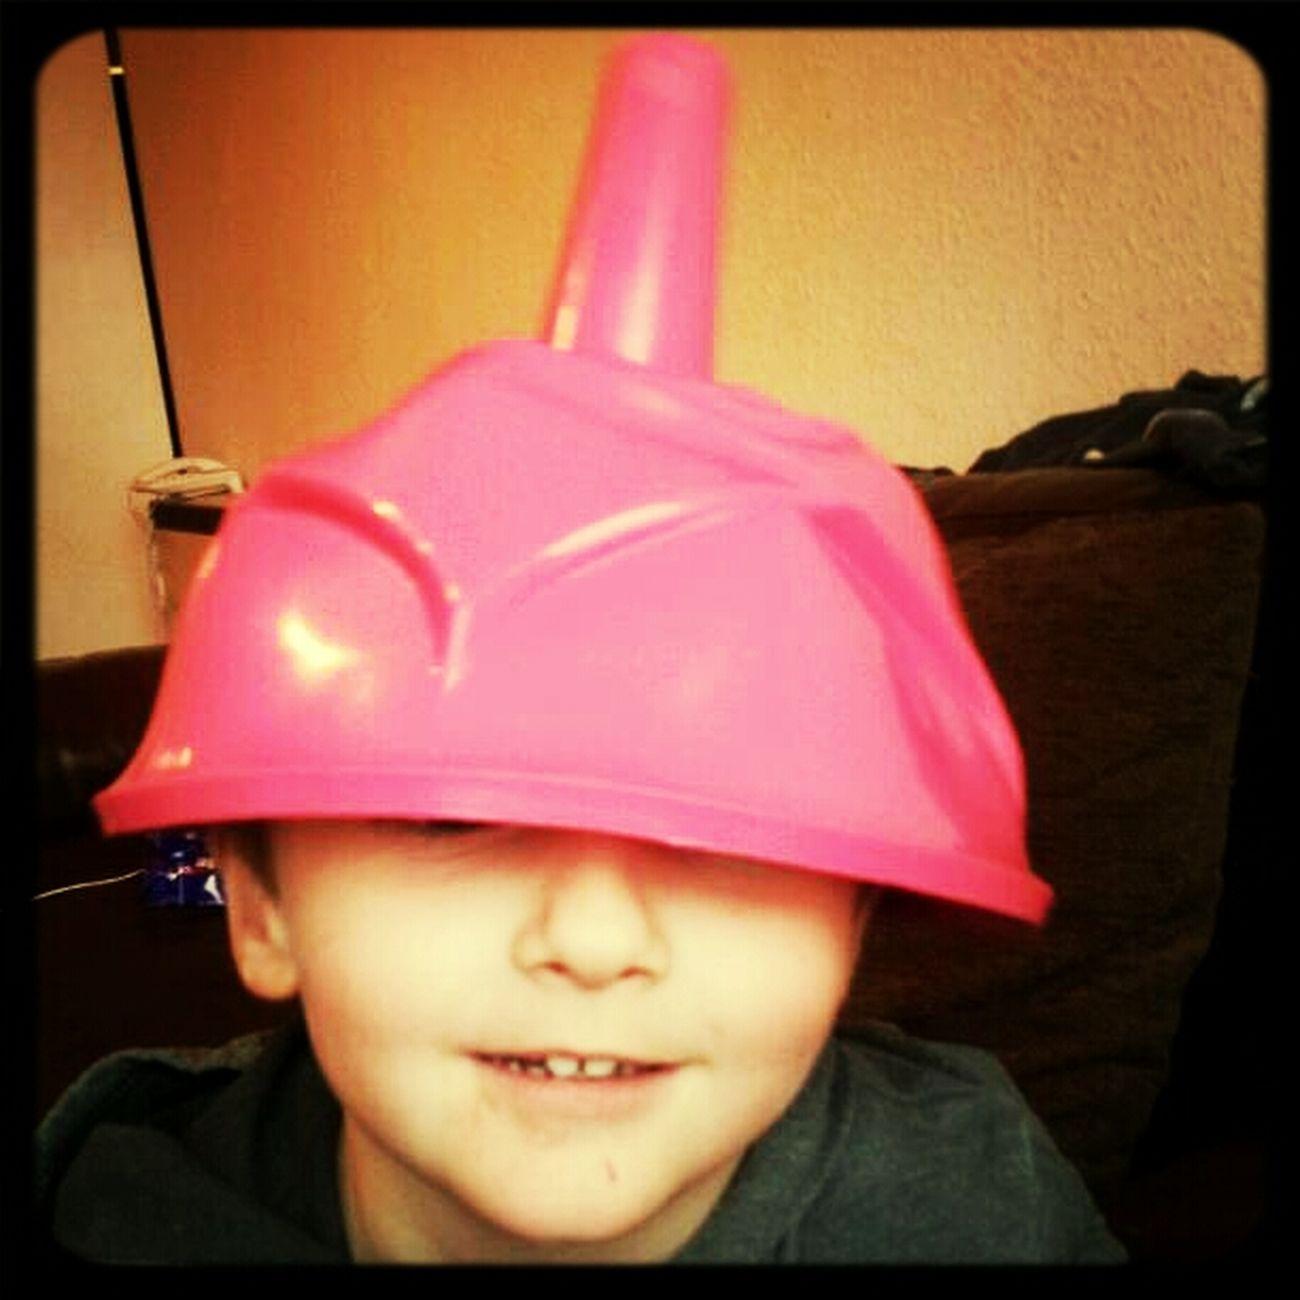 Freddie's New Hat